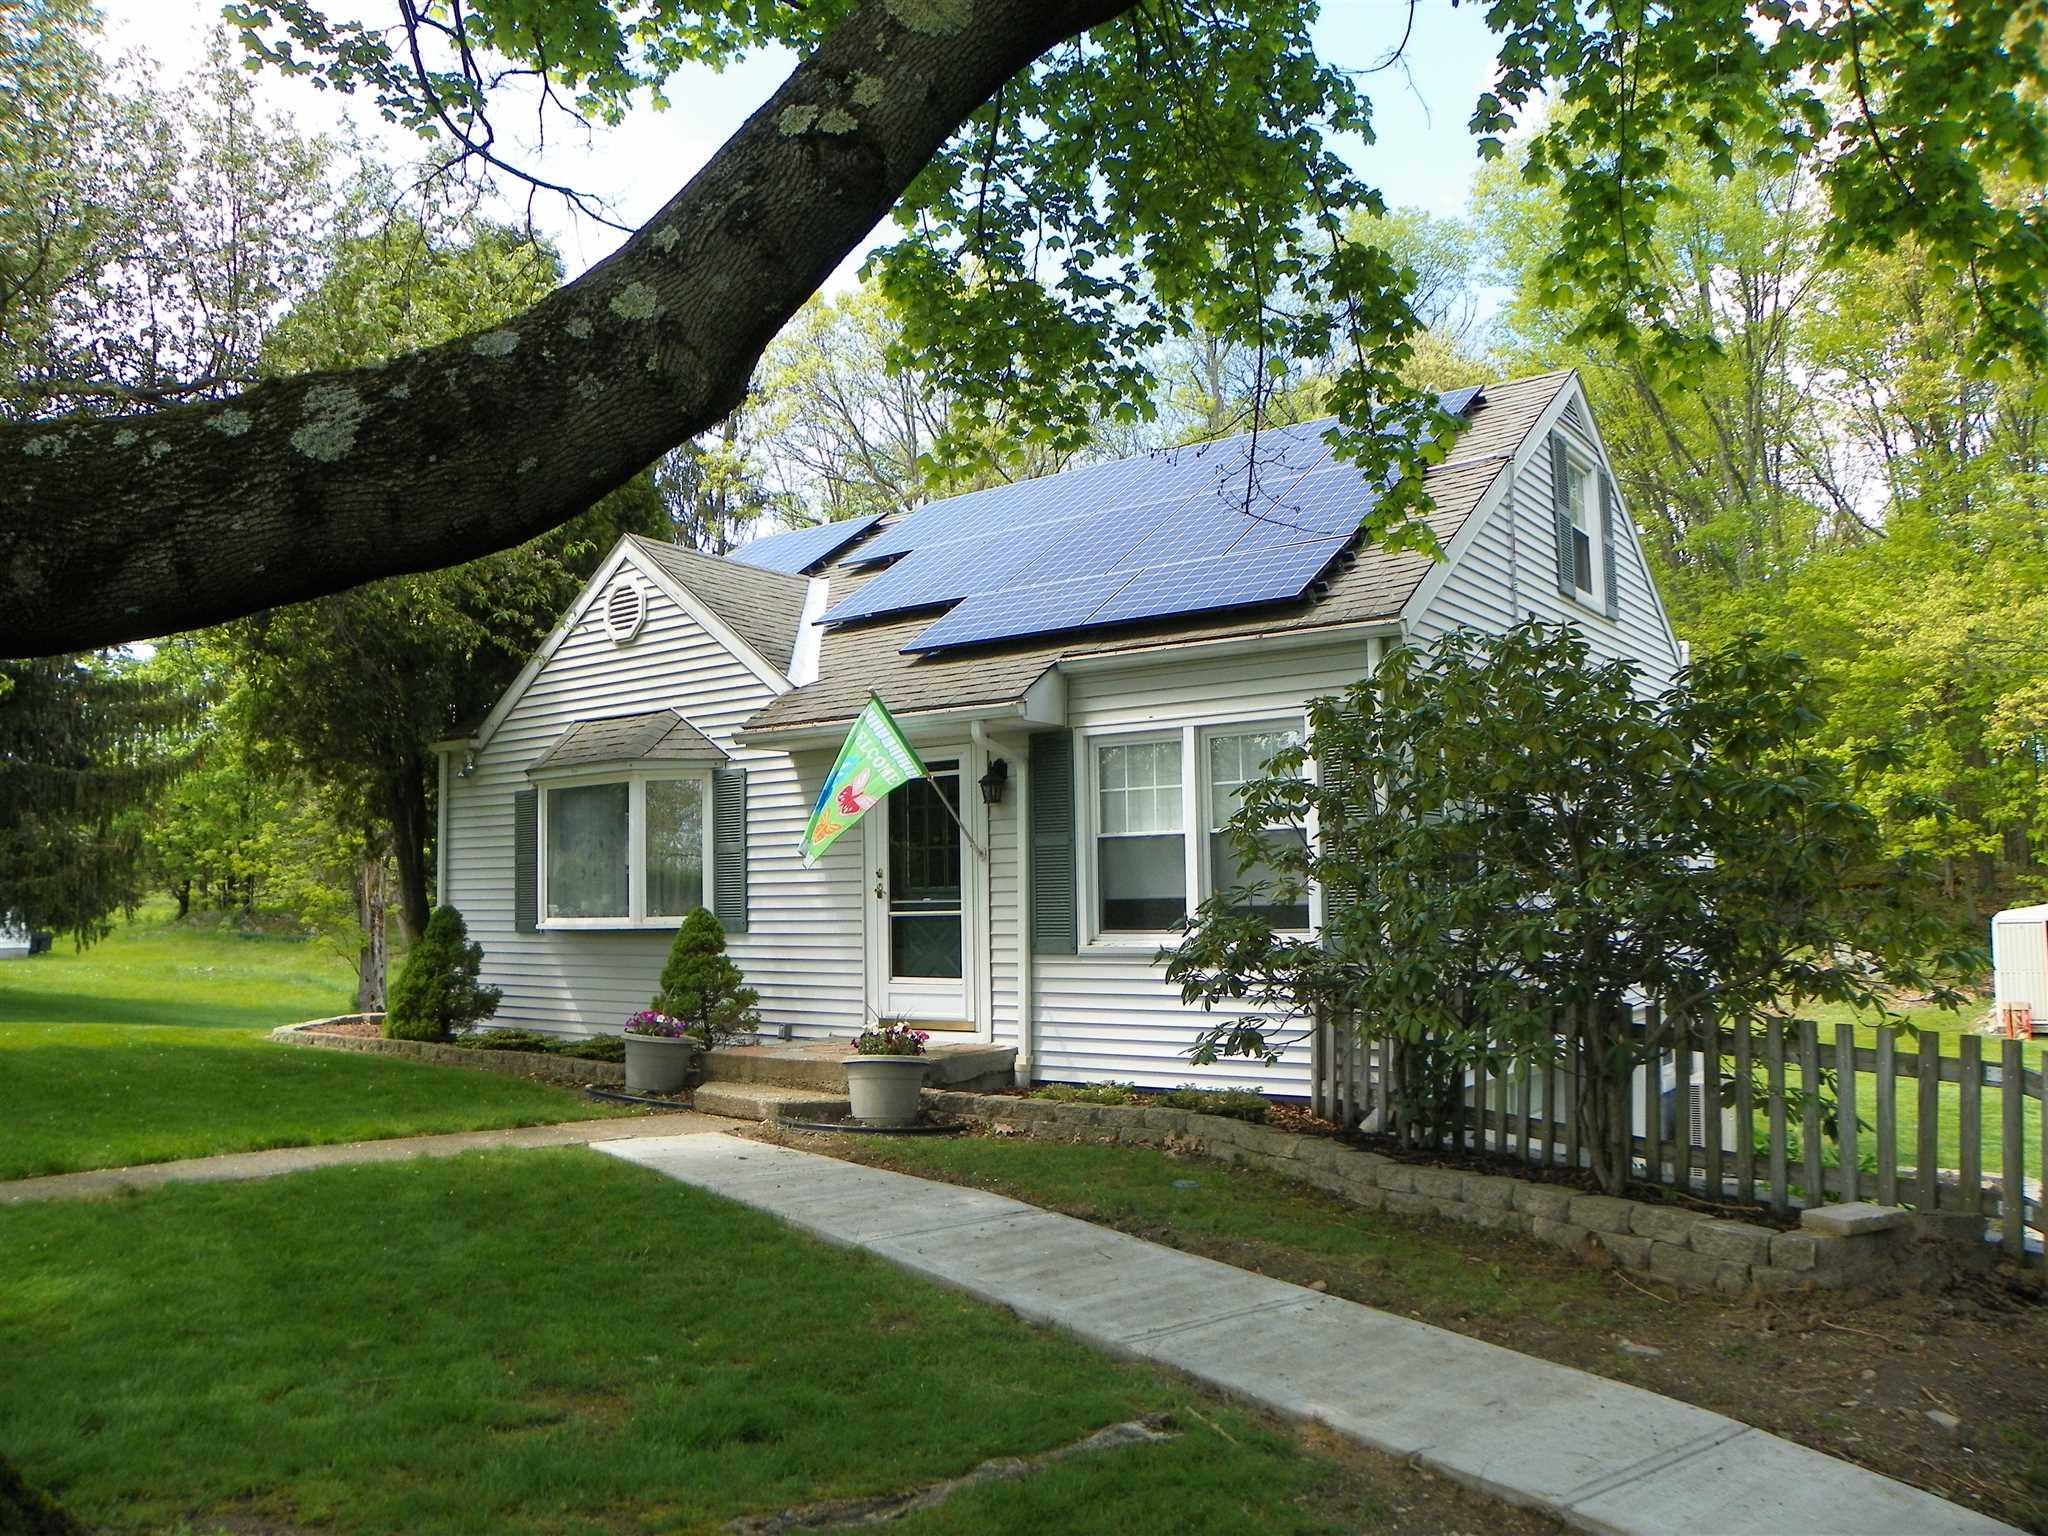 Single Family Home for Sale at 67 DORSEY Lane 67 DORSEY Lane Hyde Park, New York 12601 United States